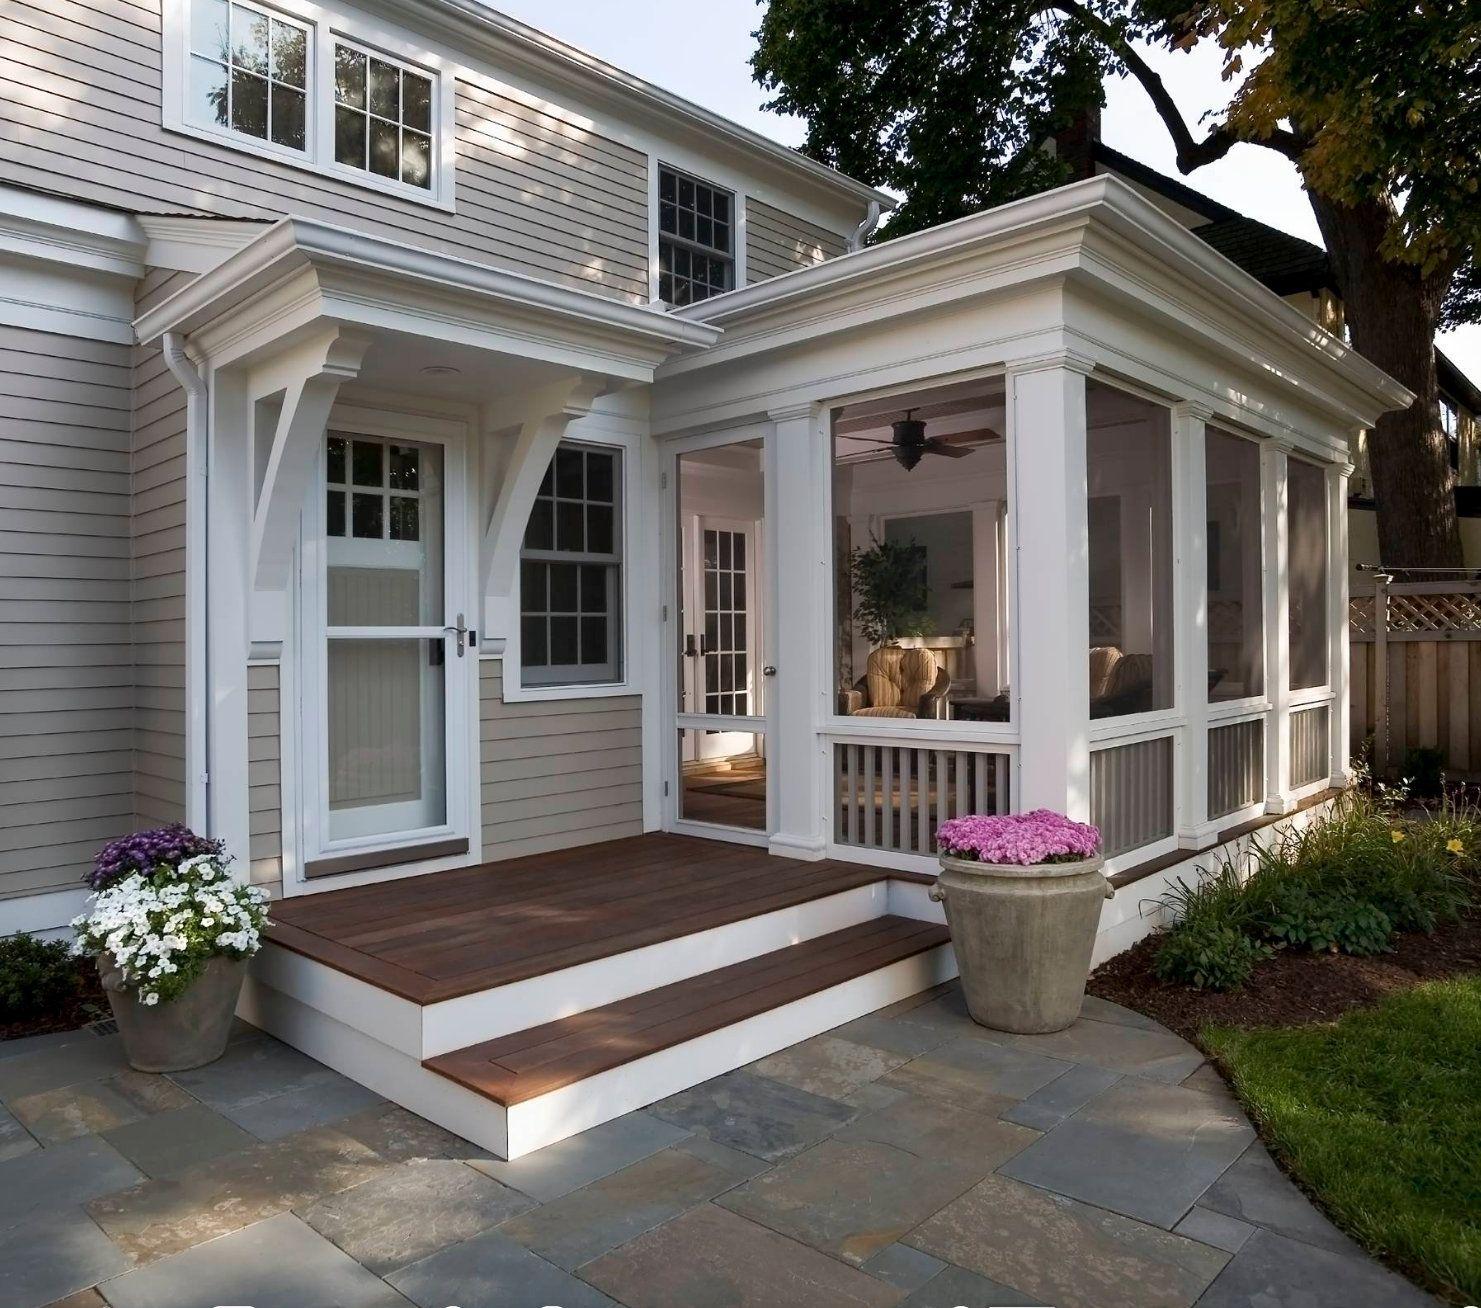 Creative Screened Porch Design ideas Screened porch